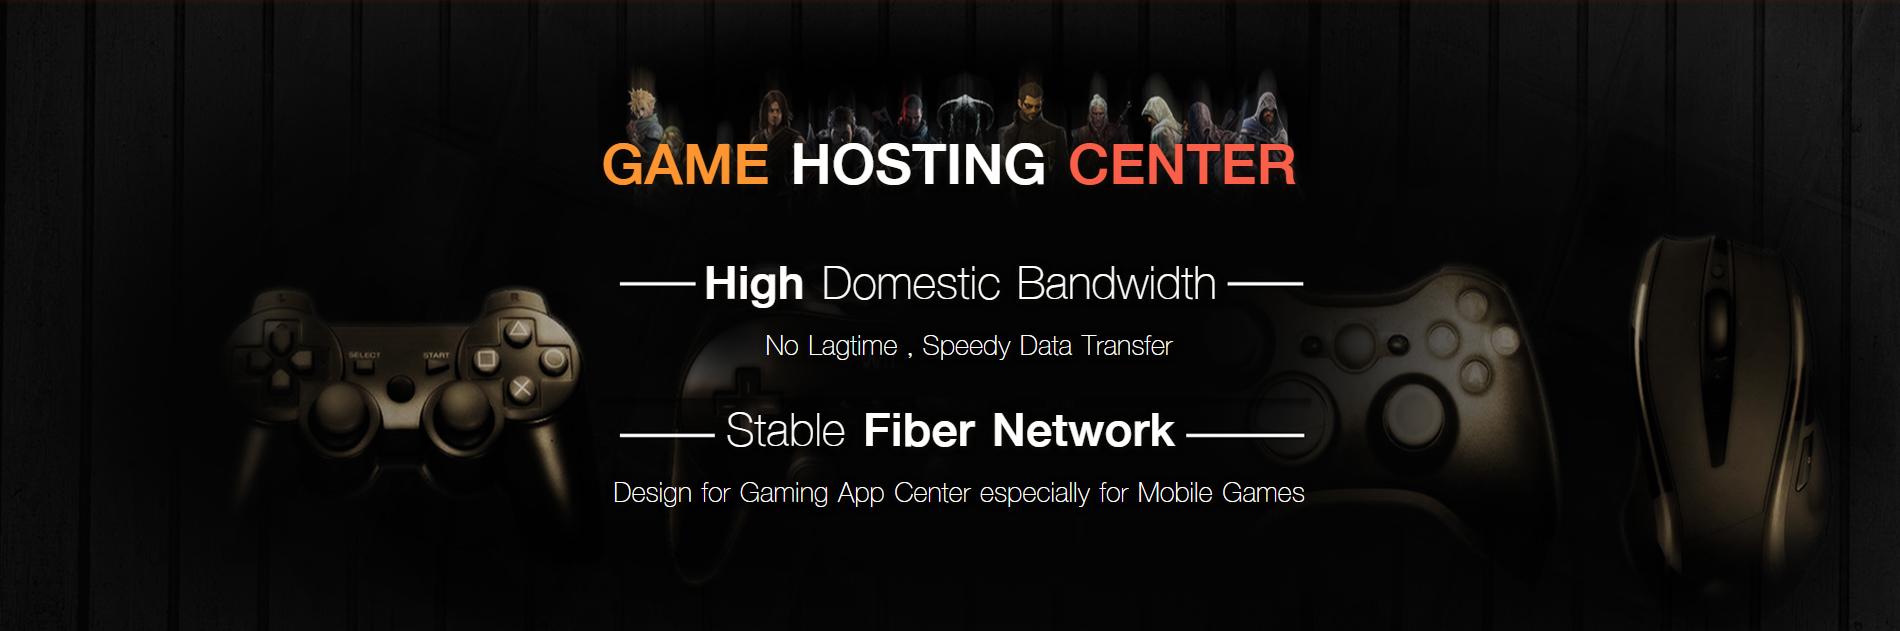 Game Hosting Center